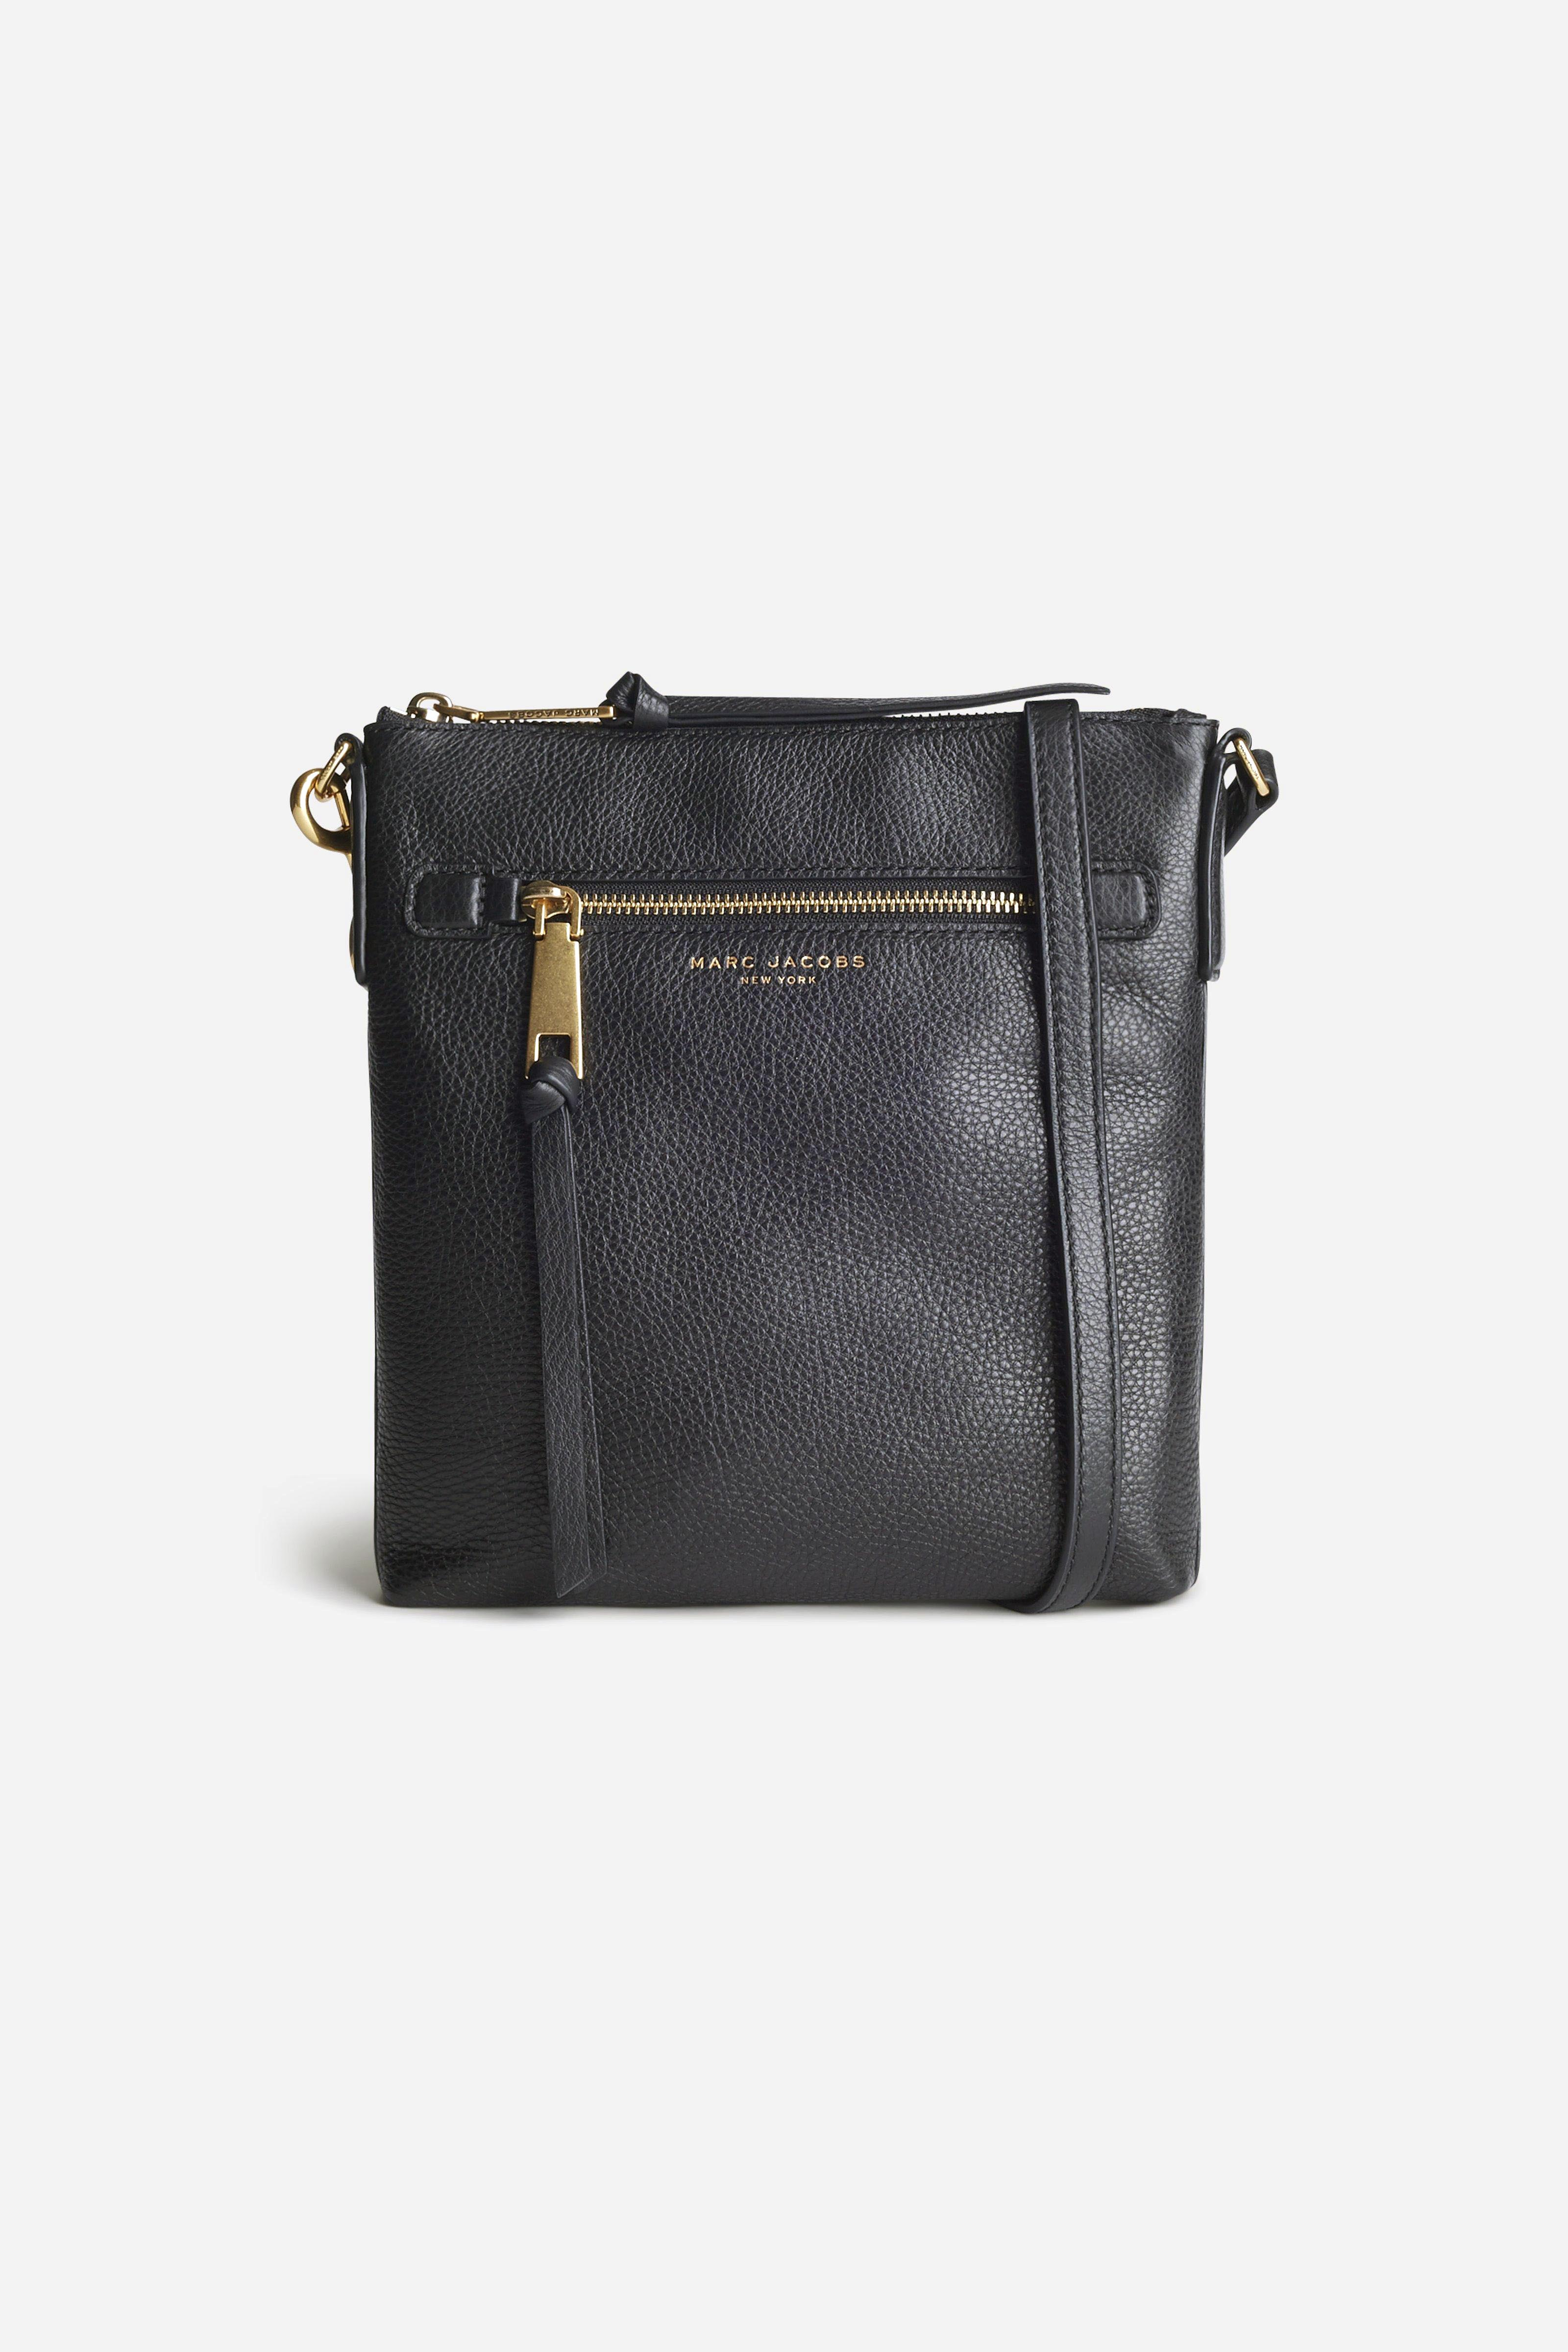 Marc Jacobs 7 - Recruit NS Crossbody Bag - Black